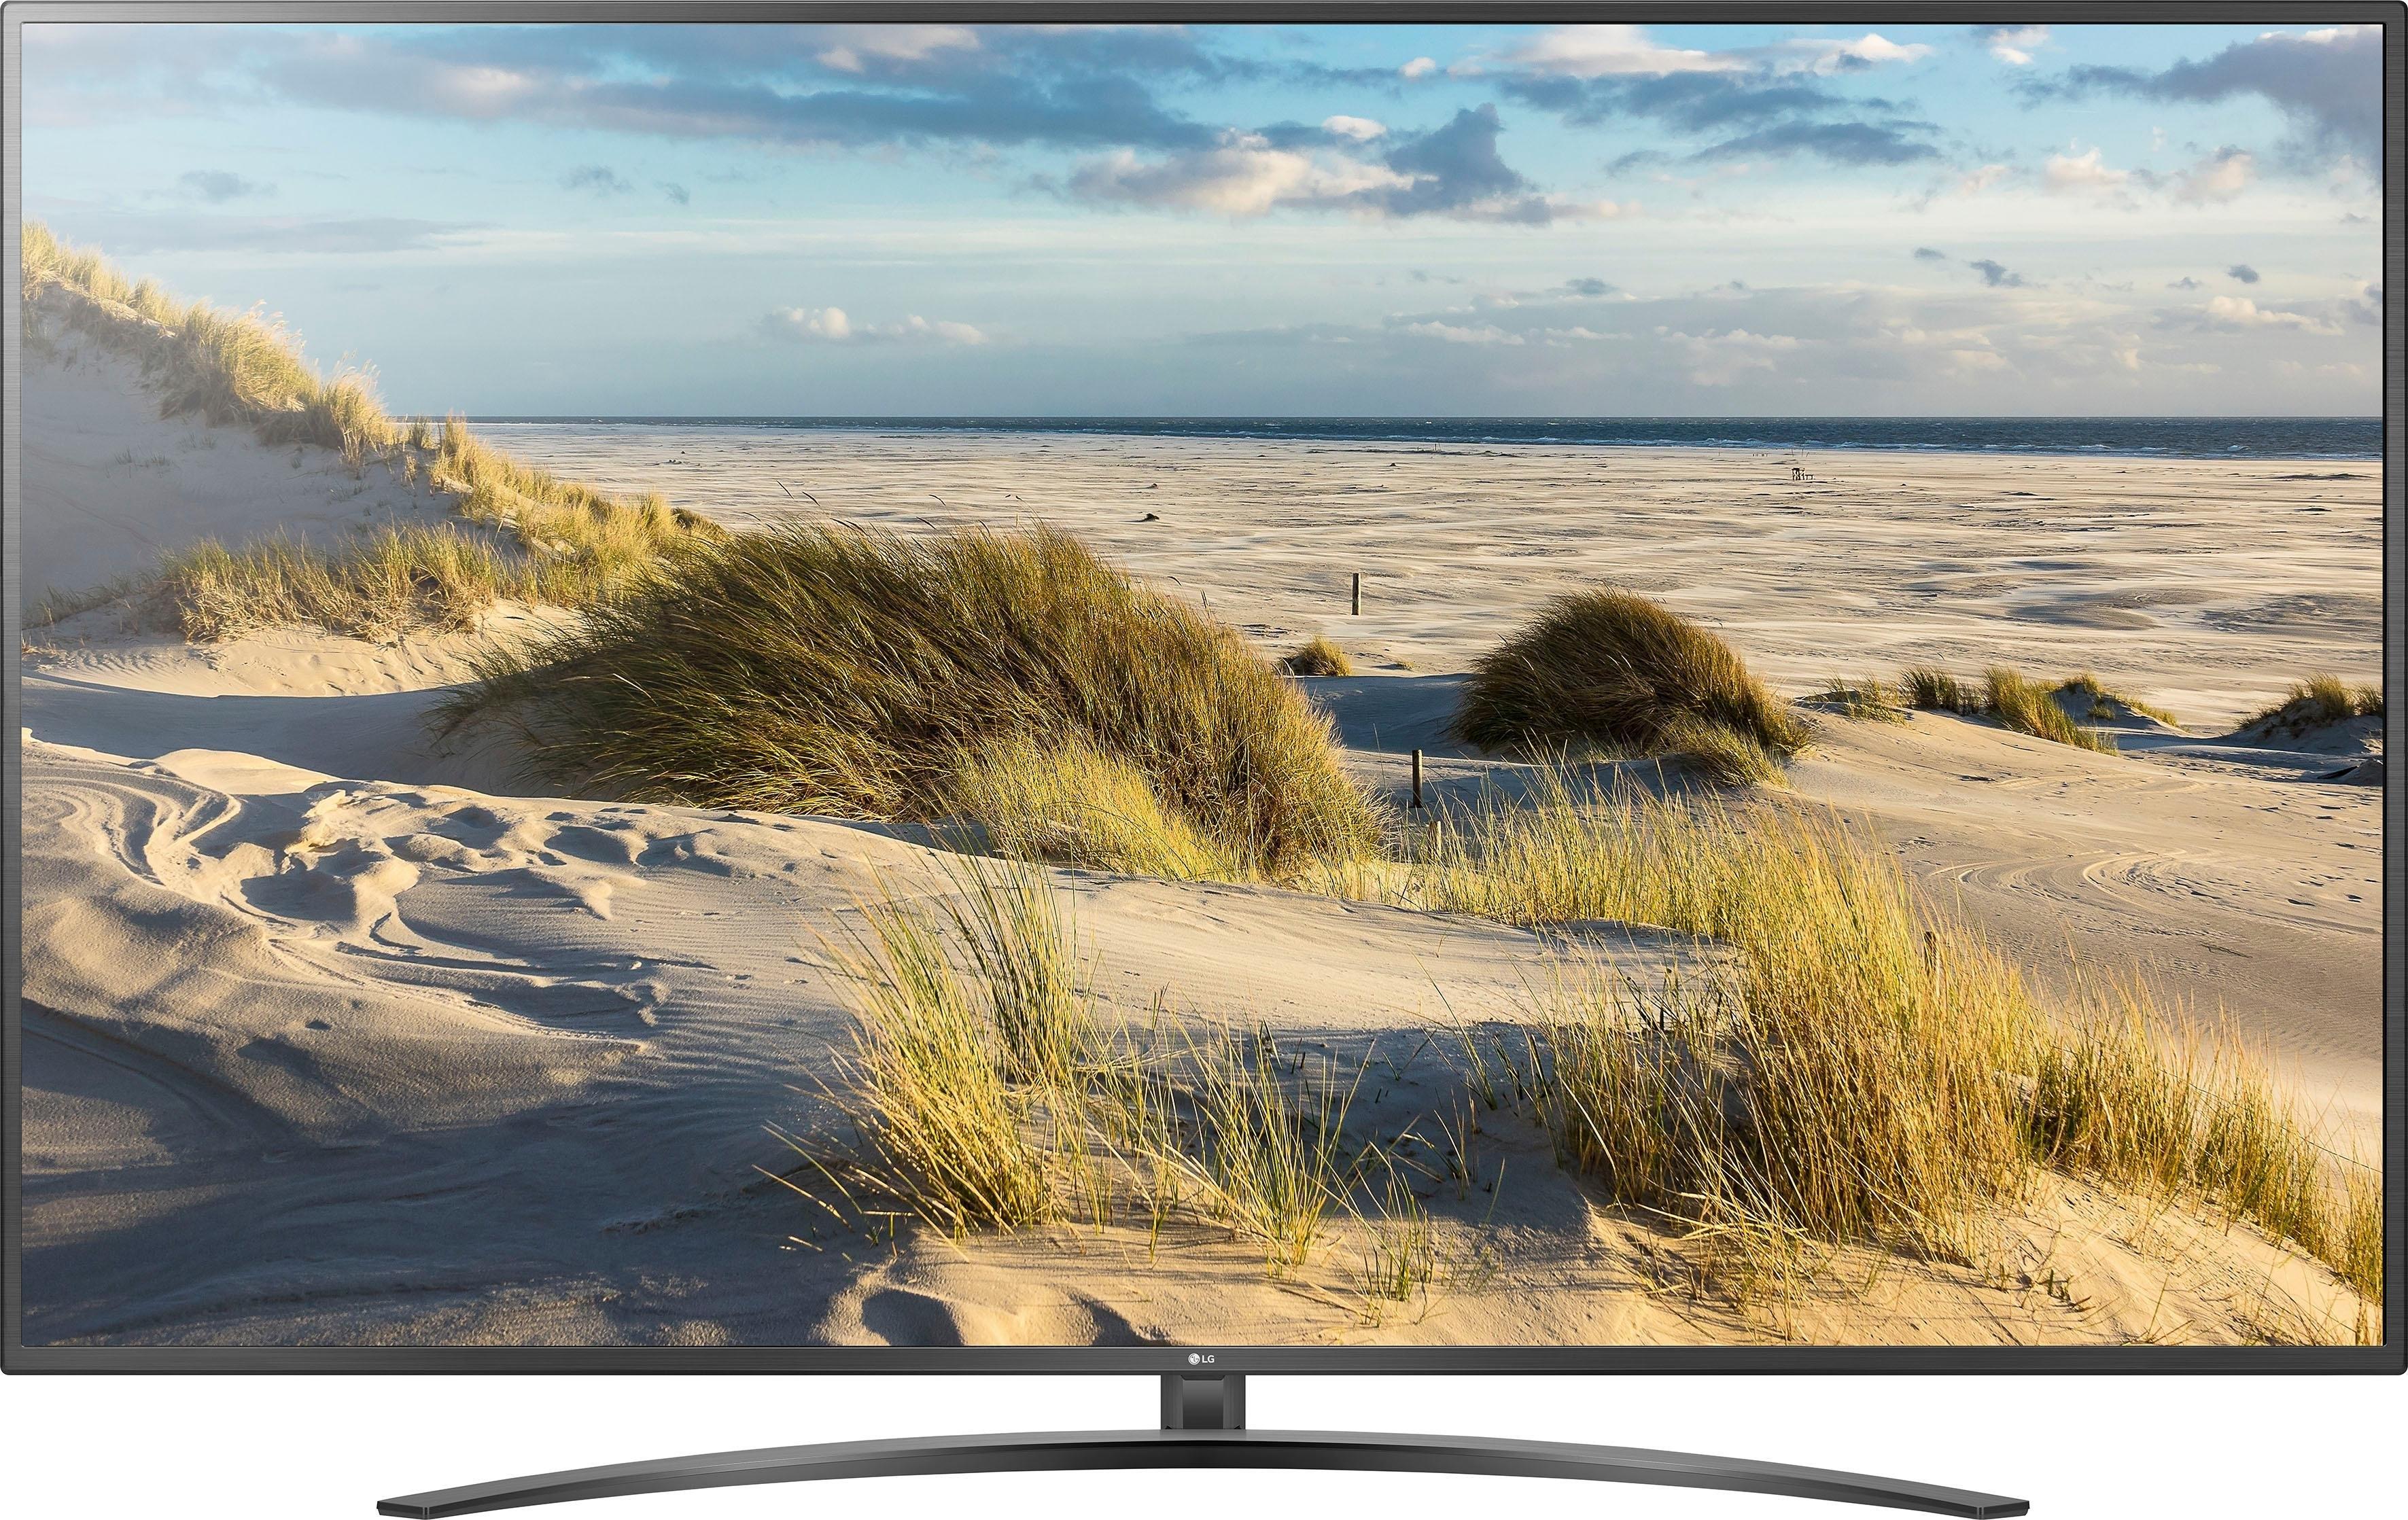 LG 82UM7600PLB led-tv (207 cm / 82 inch), 4K Ultra HD, smart-tv - gratis ruilen op otto.nl